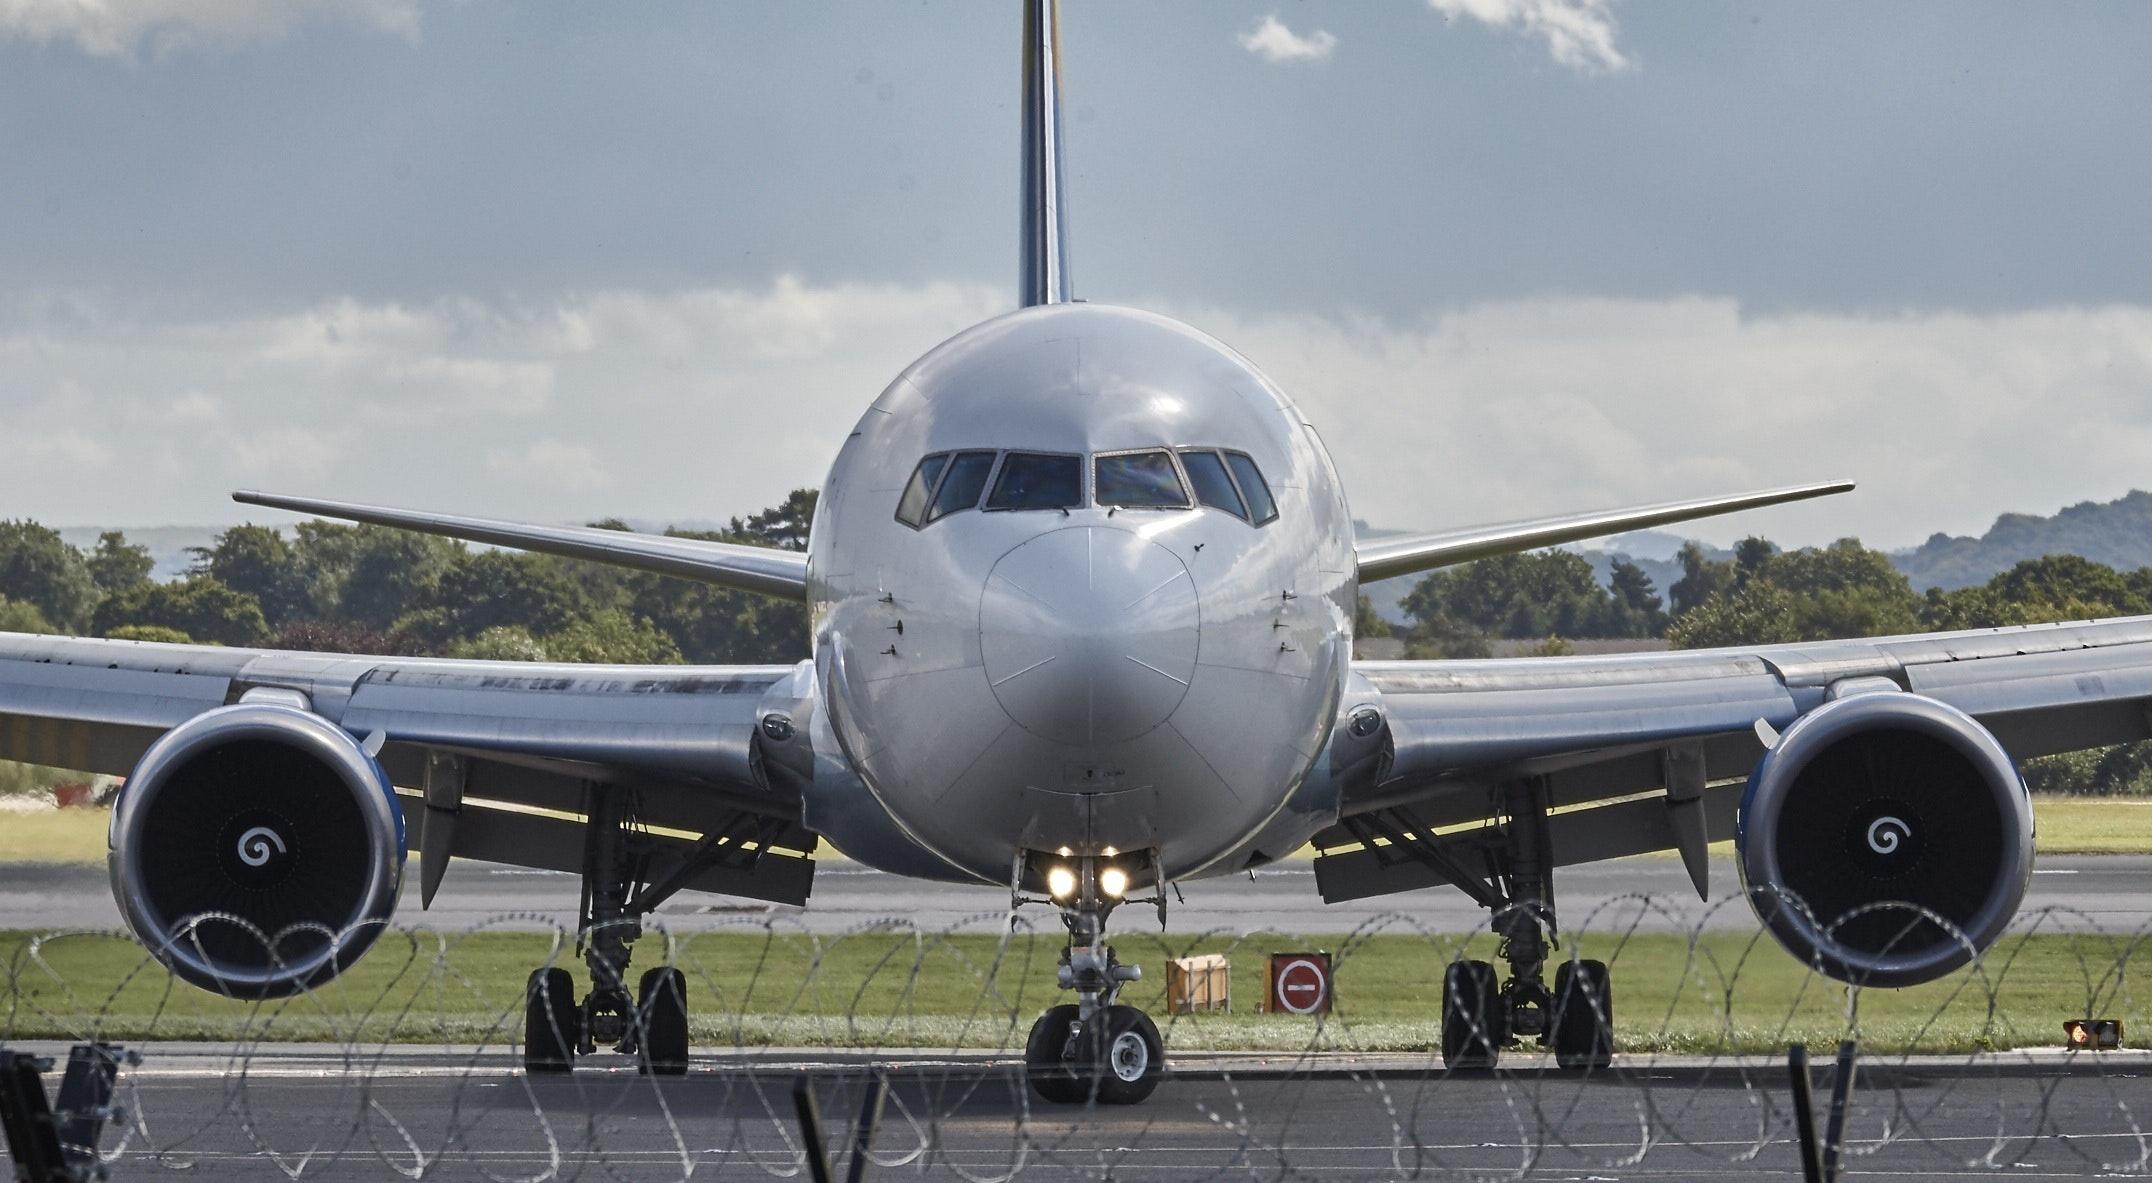 aeroplane-air-travel-aircraft-33281